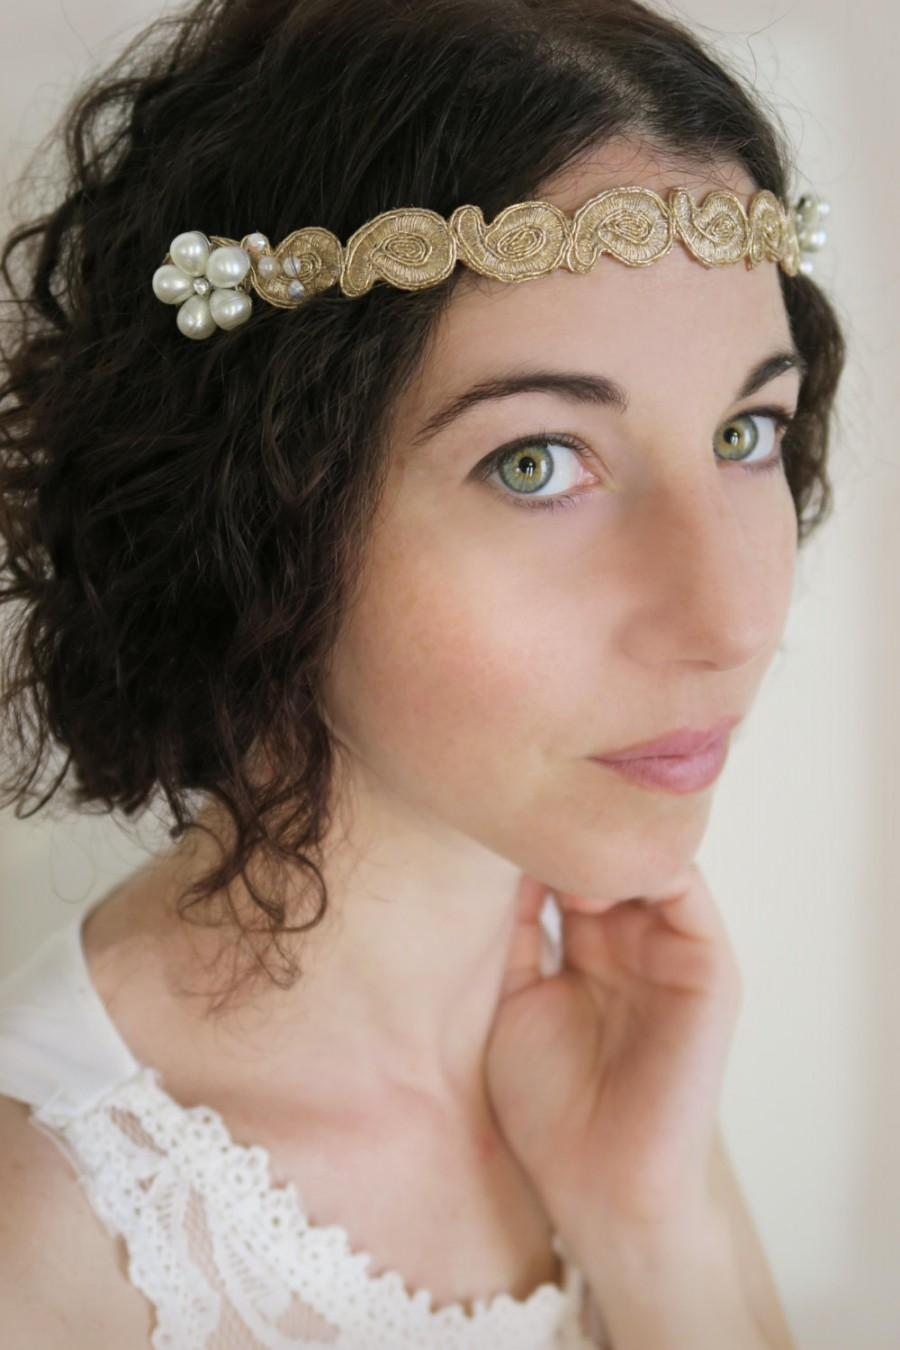 Bridal Lace Headband 0fa8fda4041